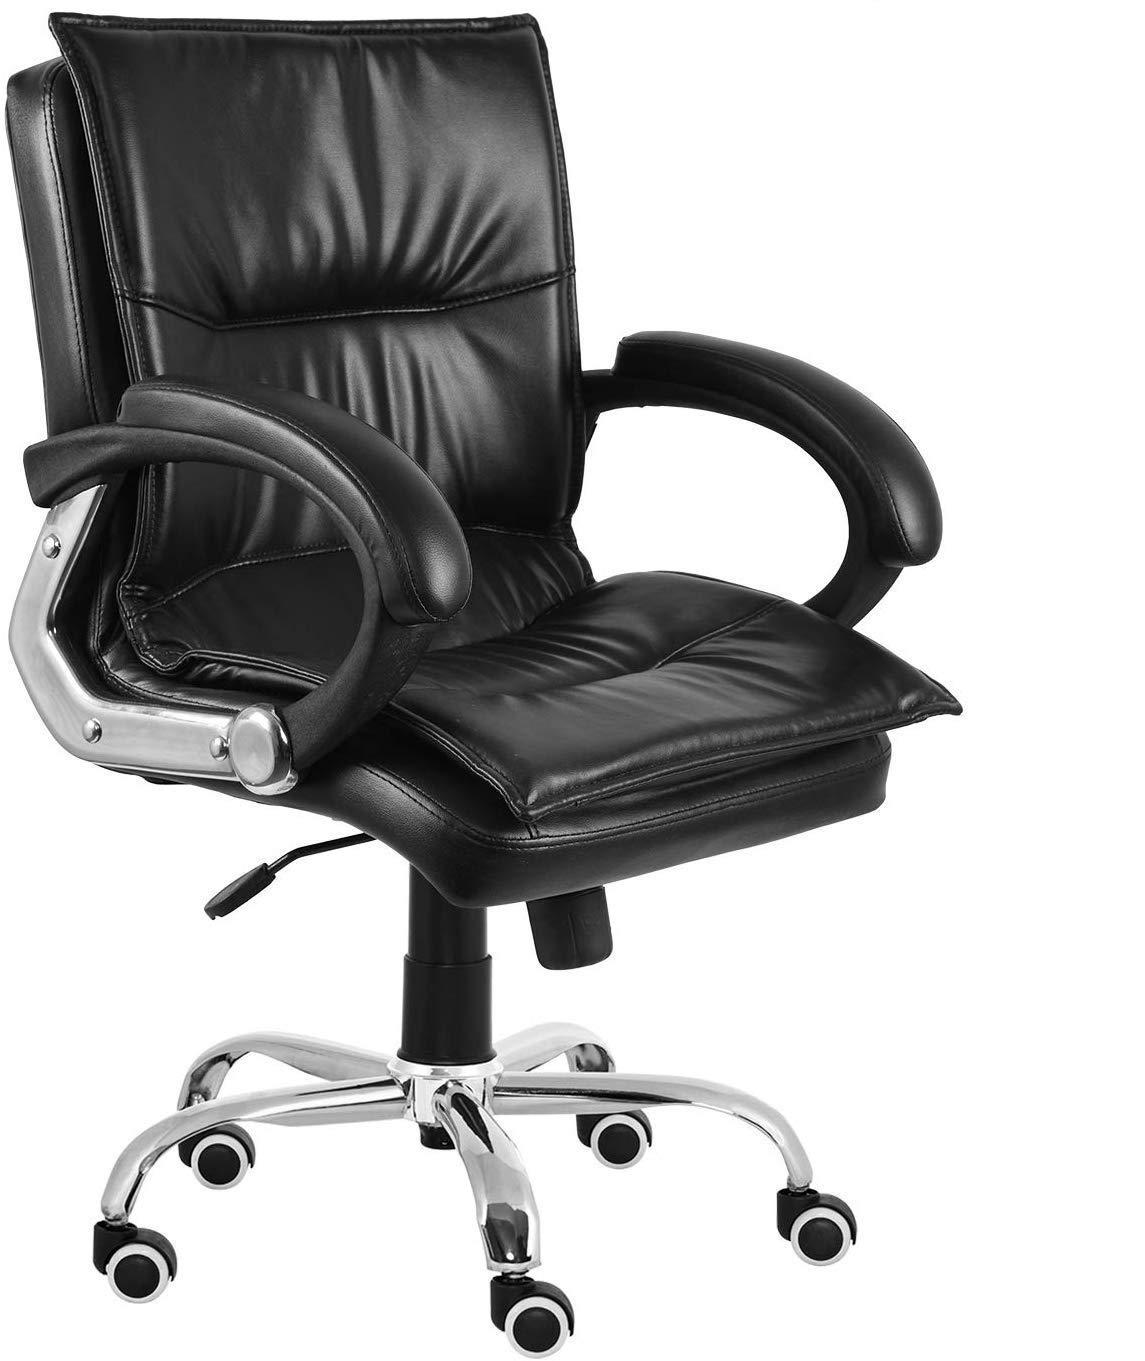 Da URBAN® Miller Medium Back revolving Office Chair